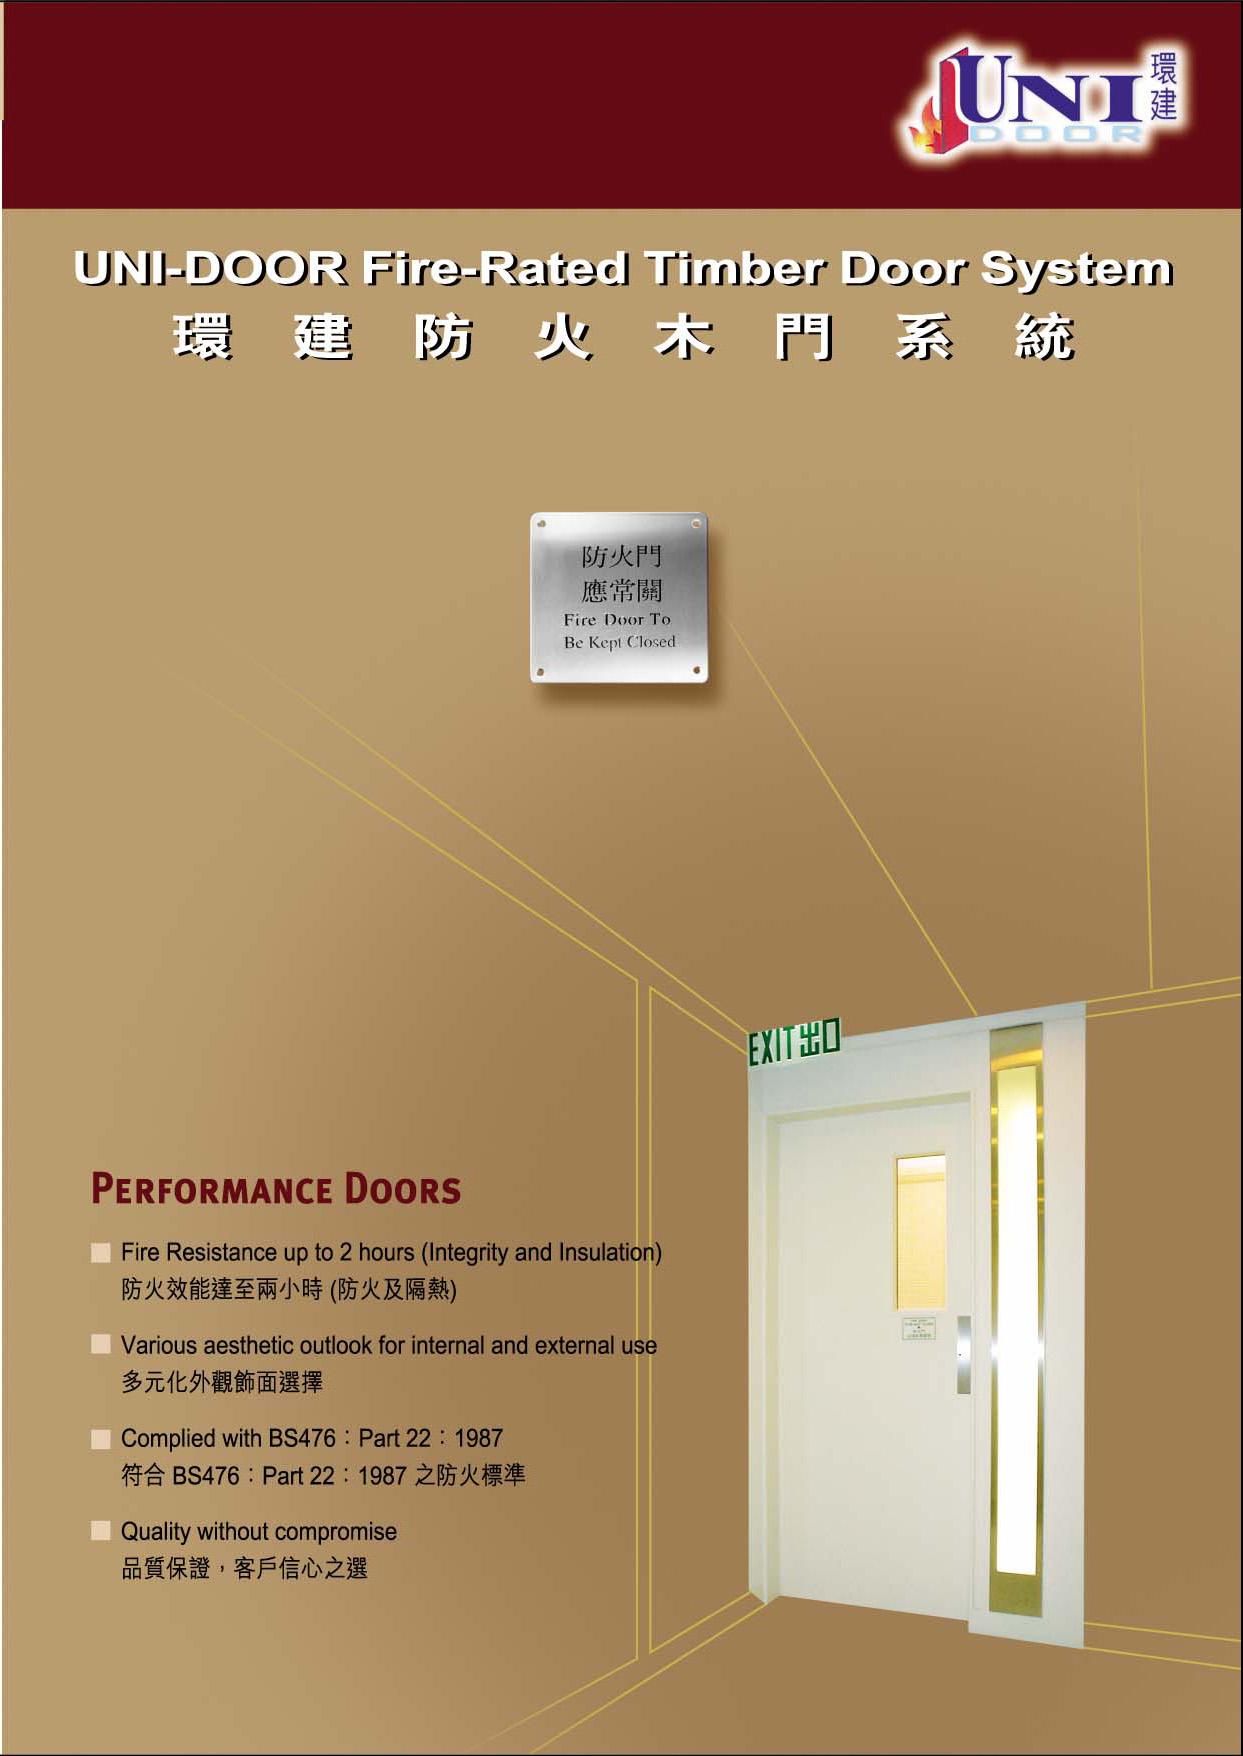 Fire Rated Timber Door System Joint Billion Fire Door